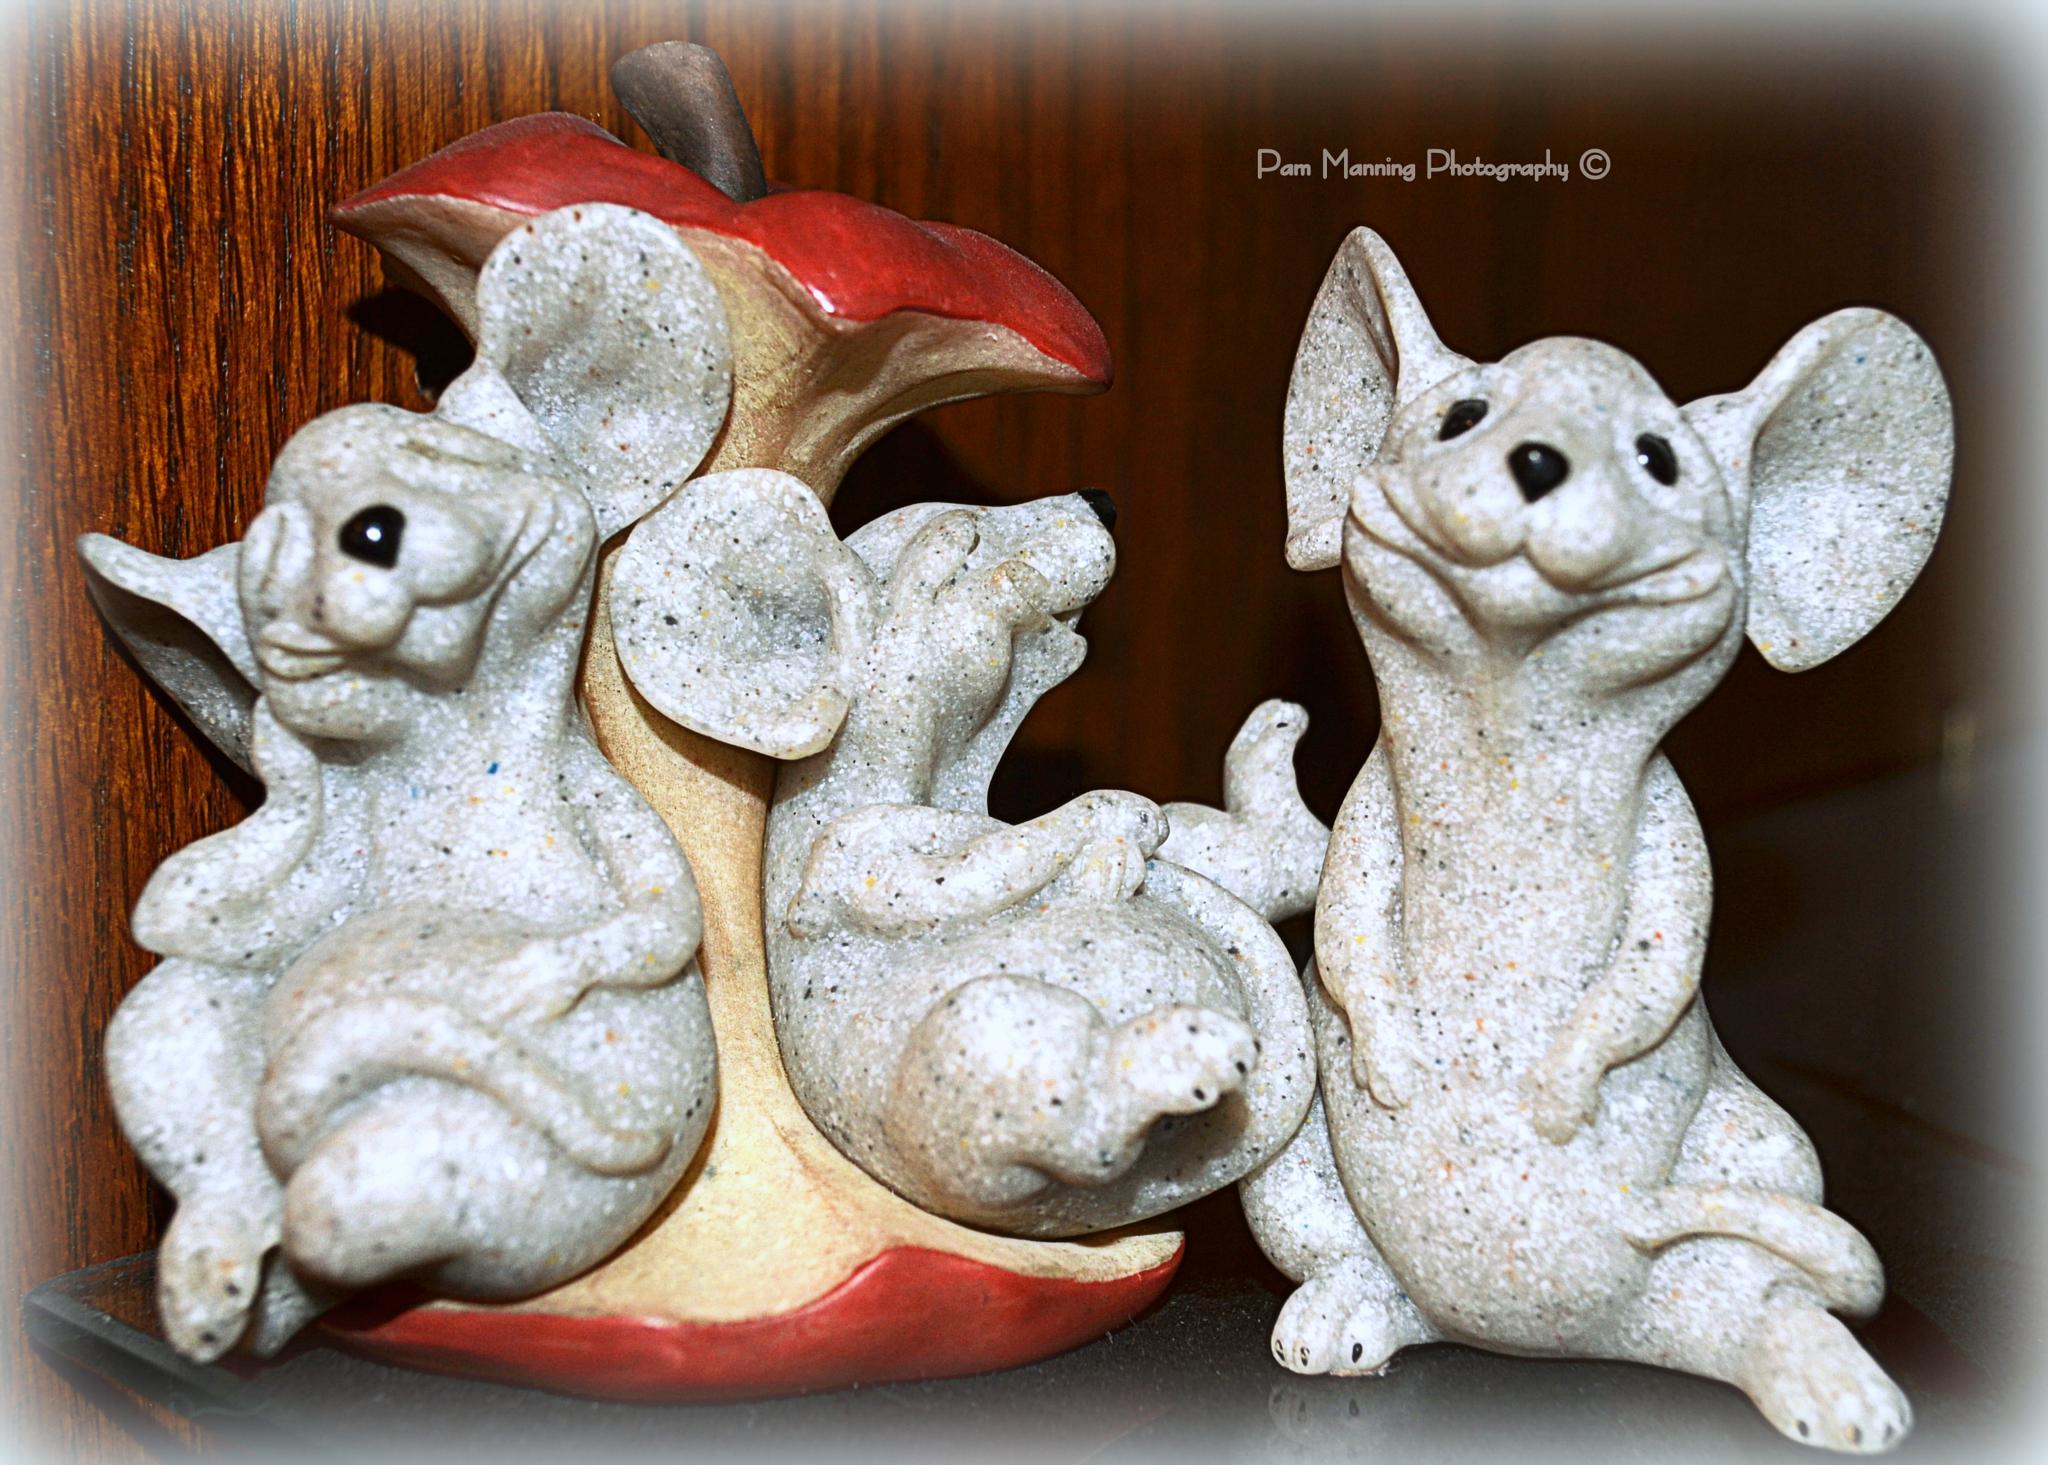 3 fat mice by pam.satterfieldmanning